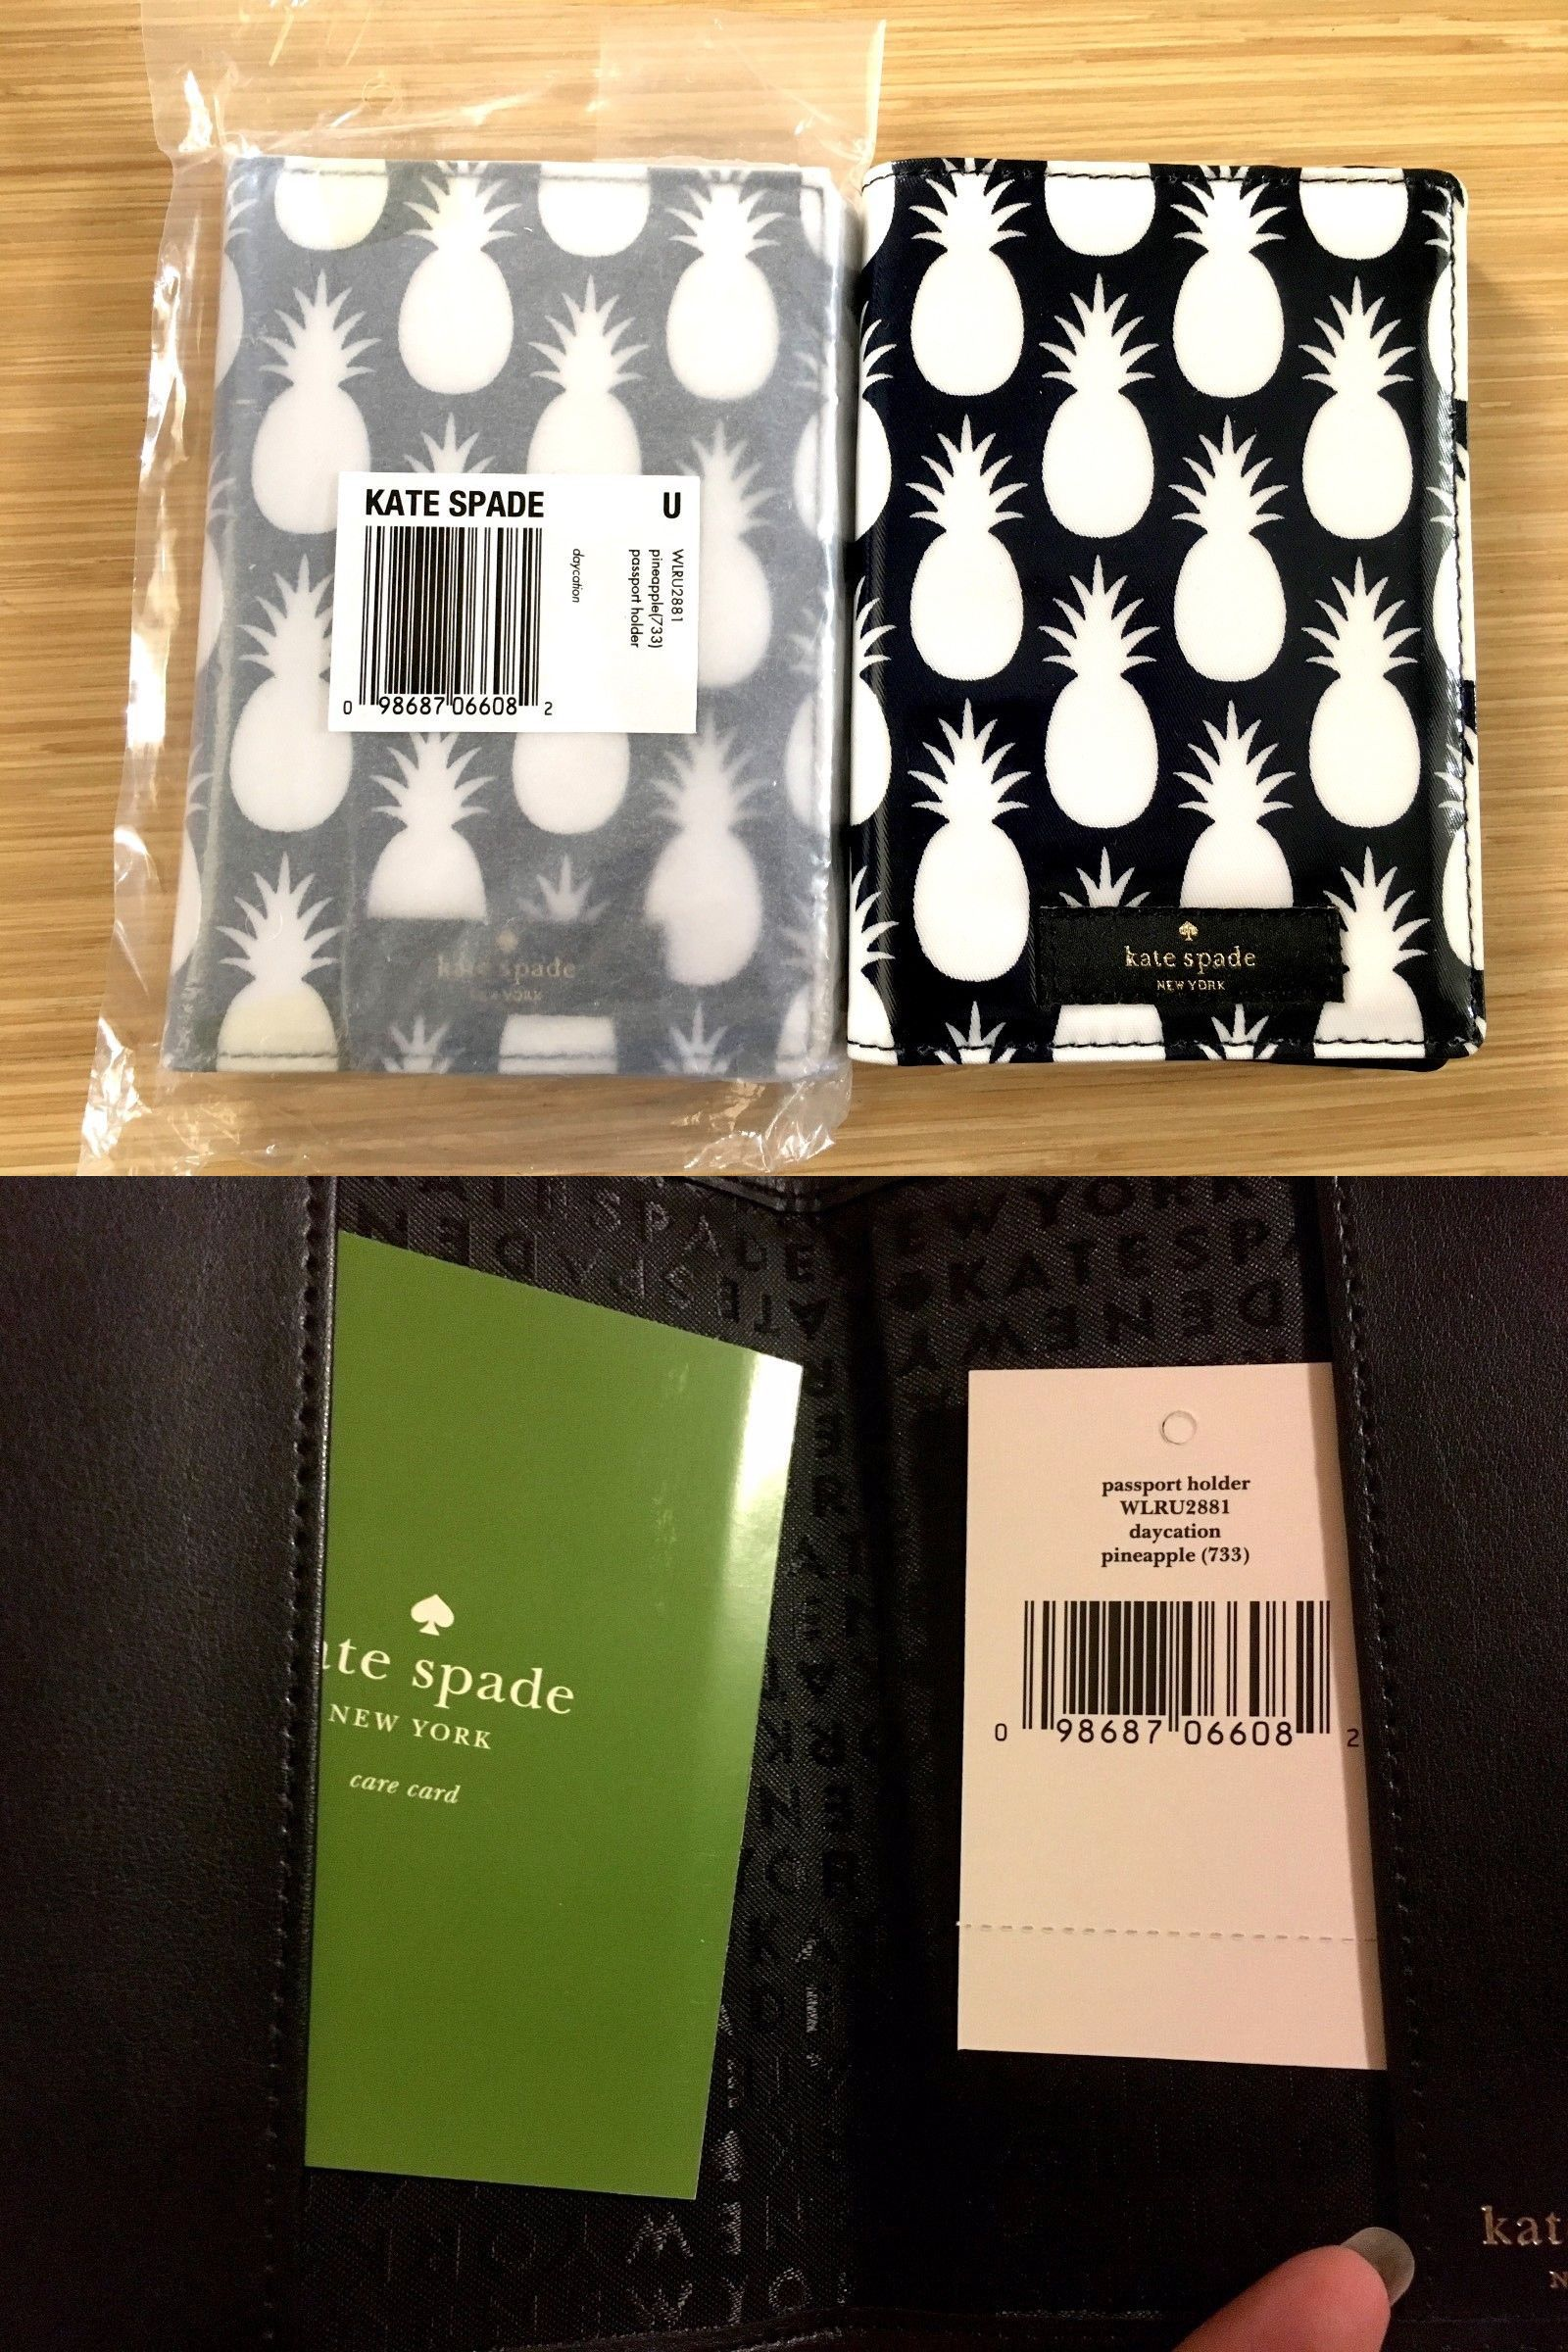 36b3860e2e1a Passport Holders 169288: New Kate Spade Daycation Pineapple Imogene Passport  Holder Wallet Wlru2881 -> BUY IT NOW ONLY: $42 on eBay!